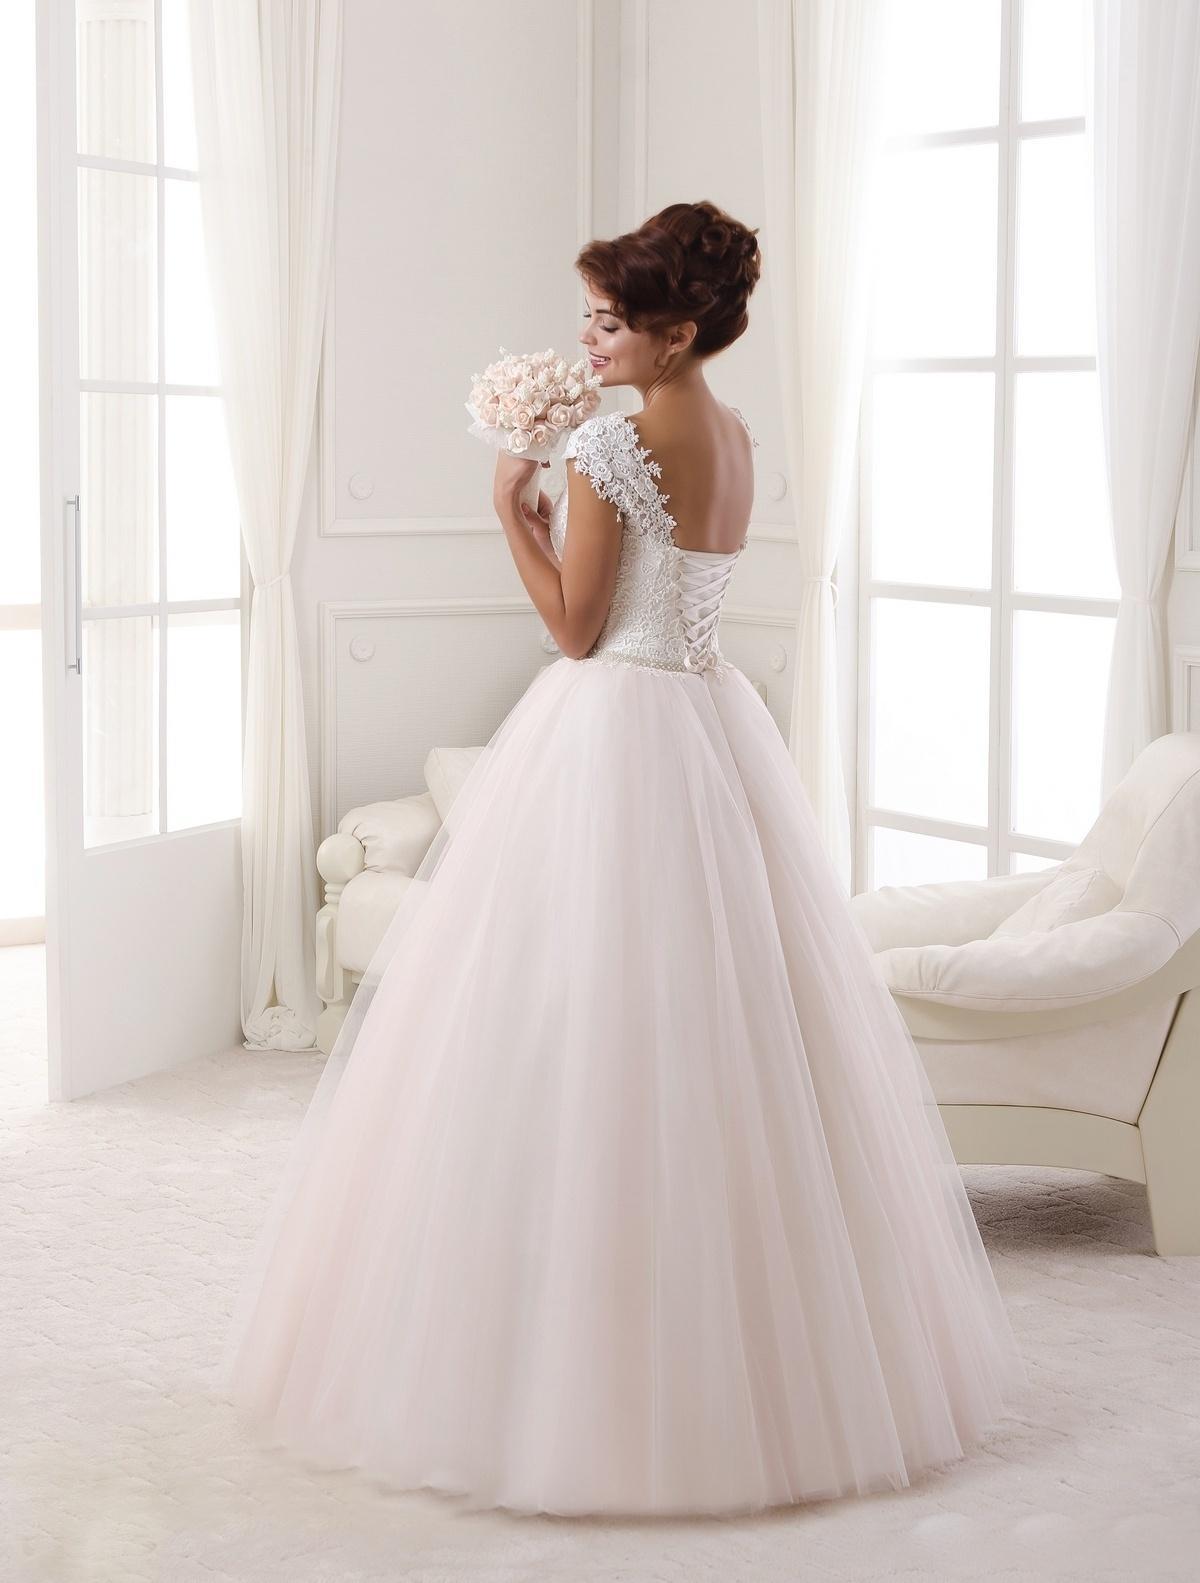 Svadobné šaty NOVÉ 16-295 - Obrázok č. 3